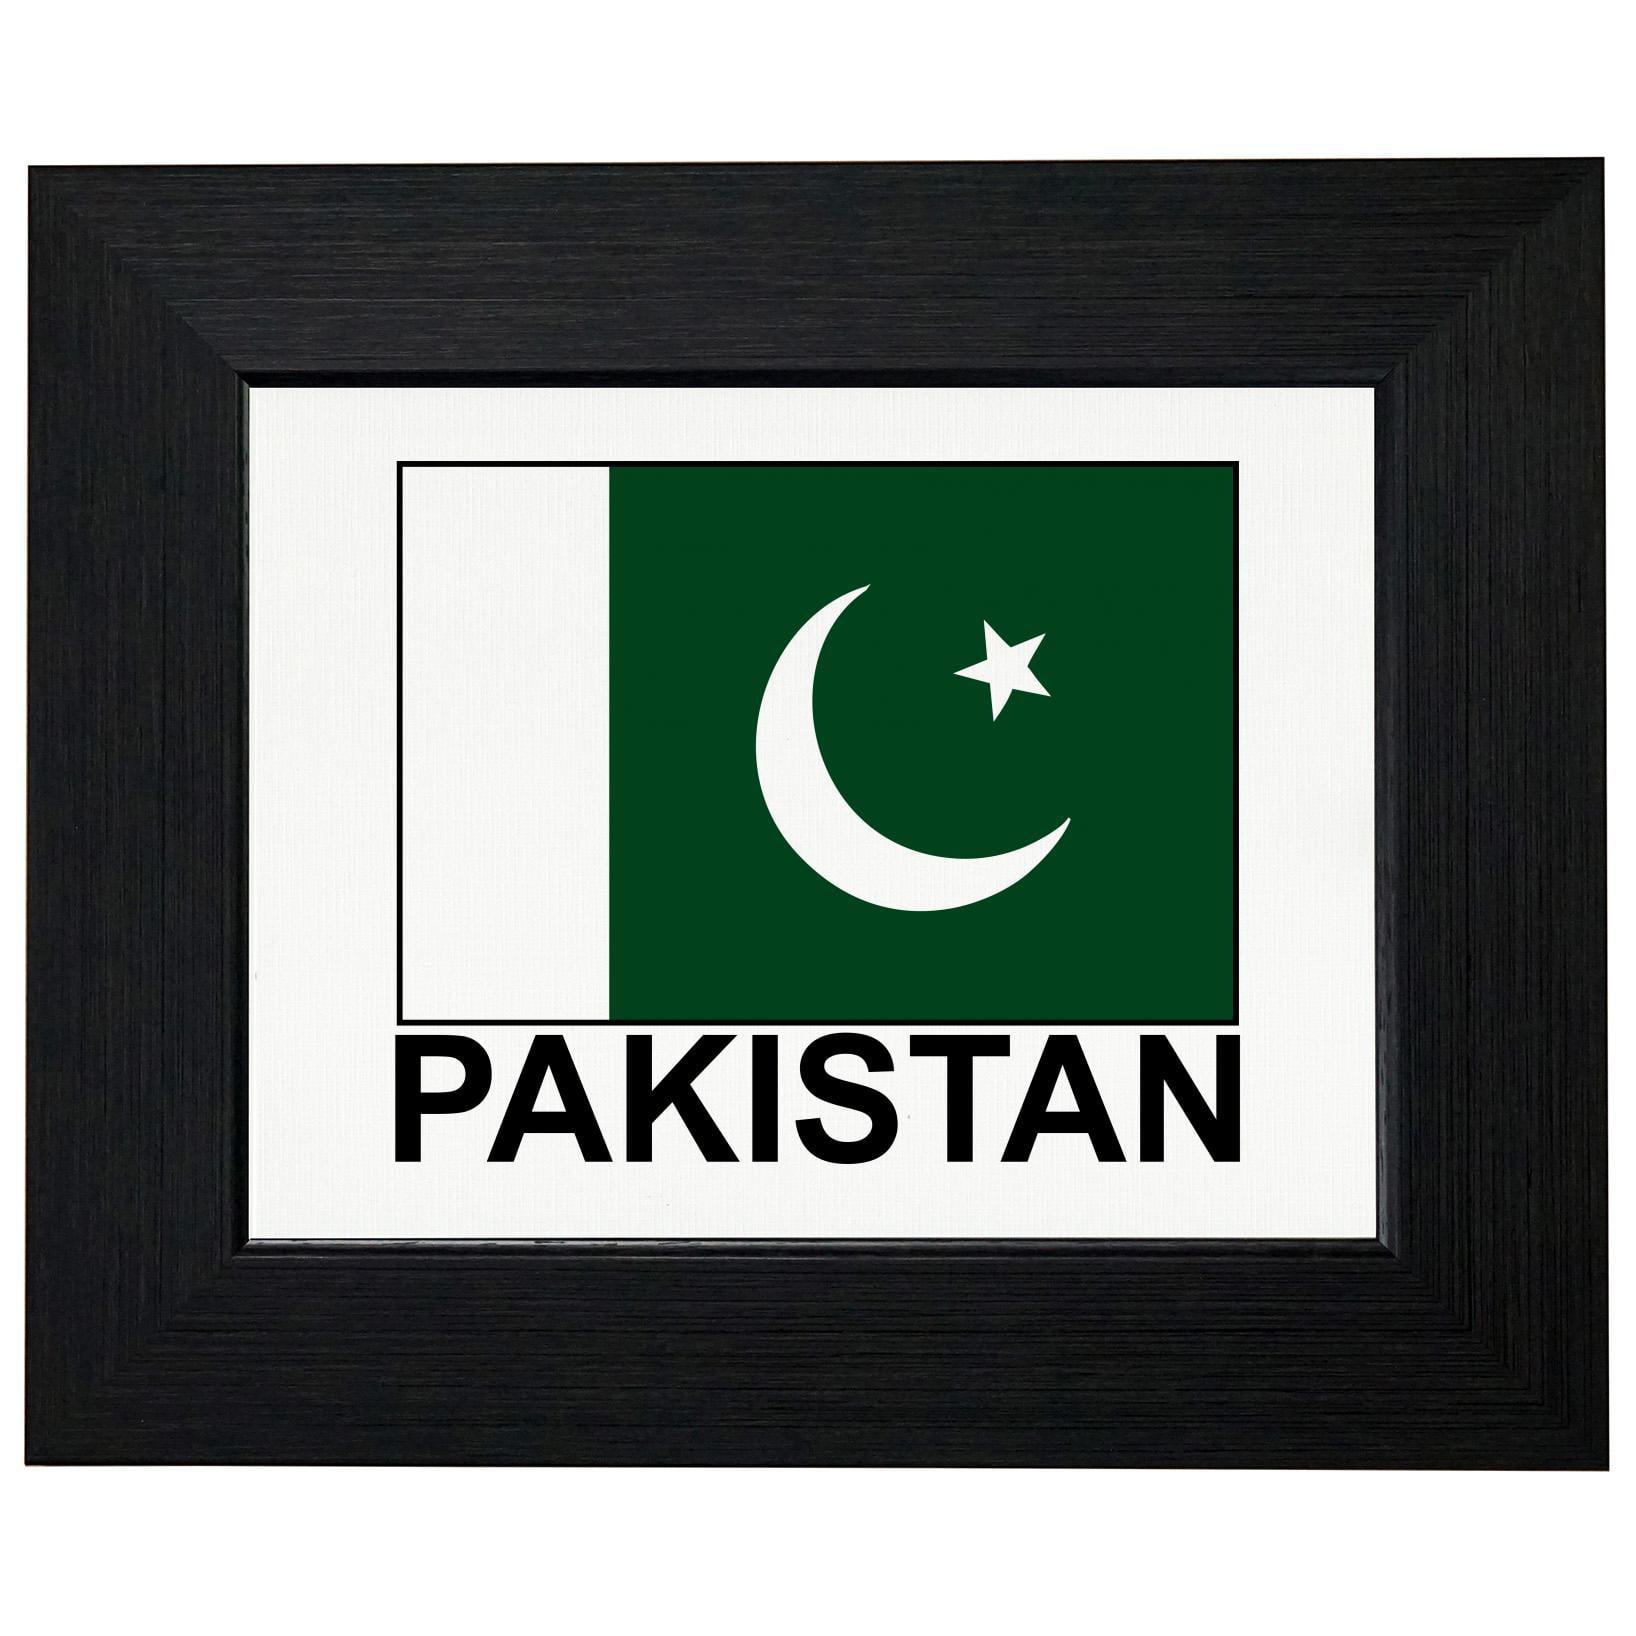 Pakistan Flag - Special Vintage Edition Framed Print Poster Wall or Desk Mount Options